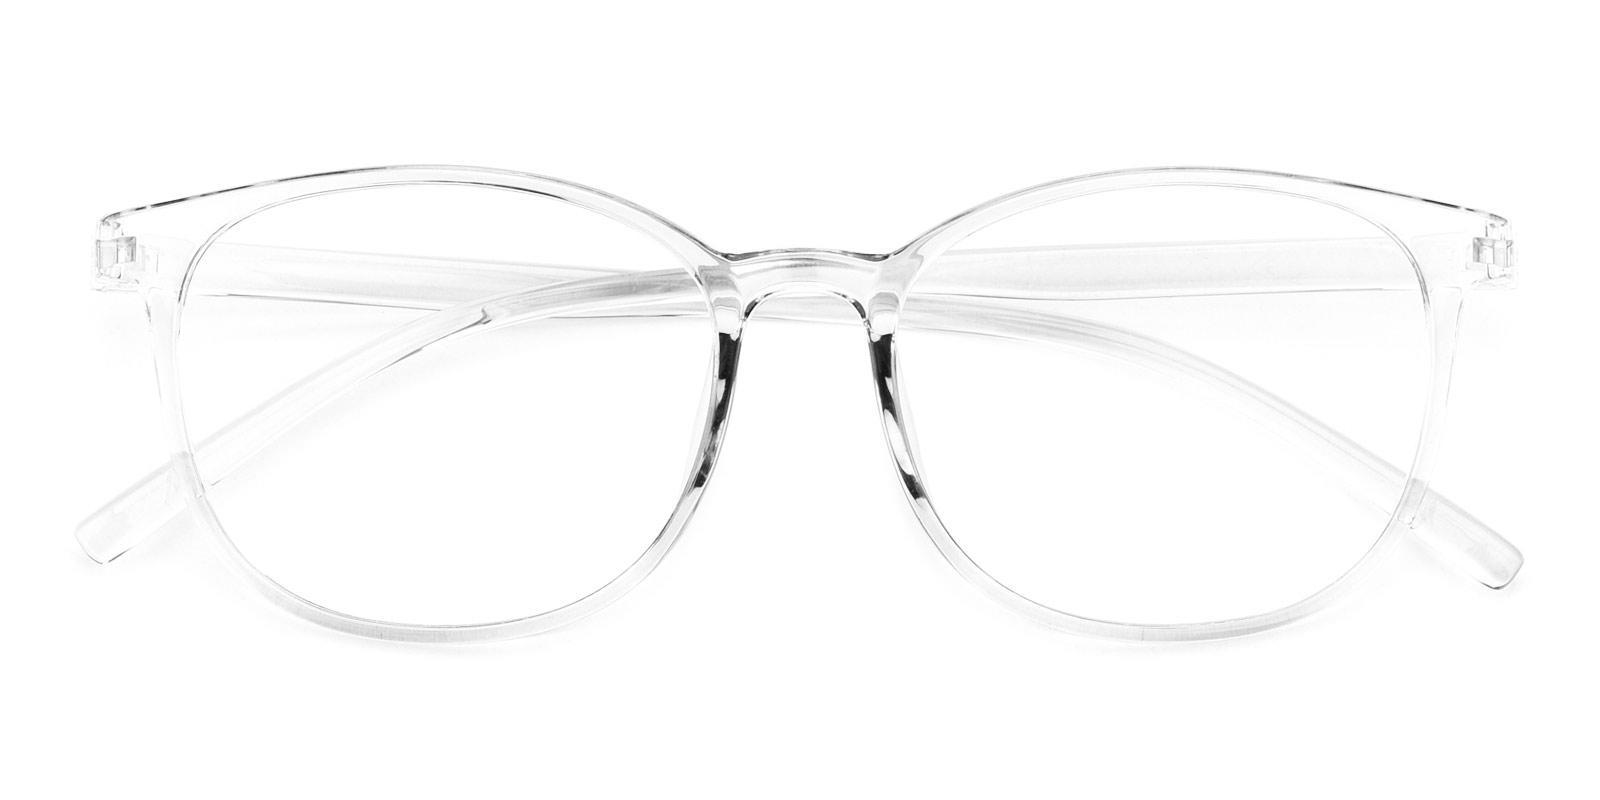 Geoff-Translucent-Rectangle / Round-TR-Eyeglasses-detail